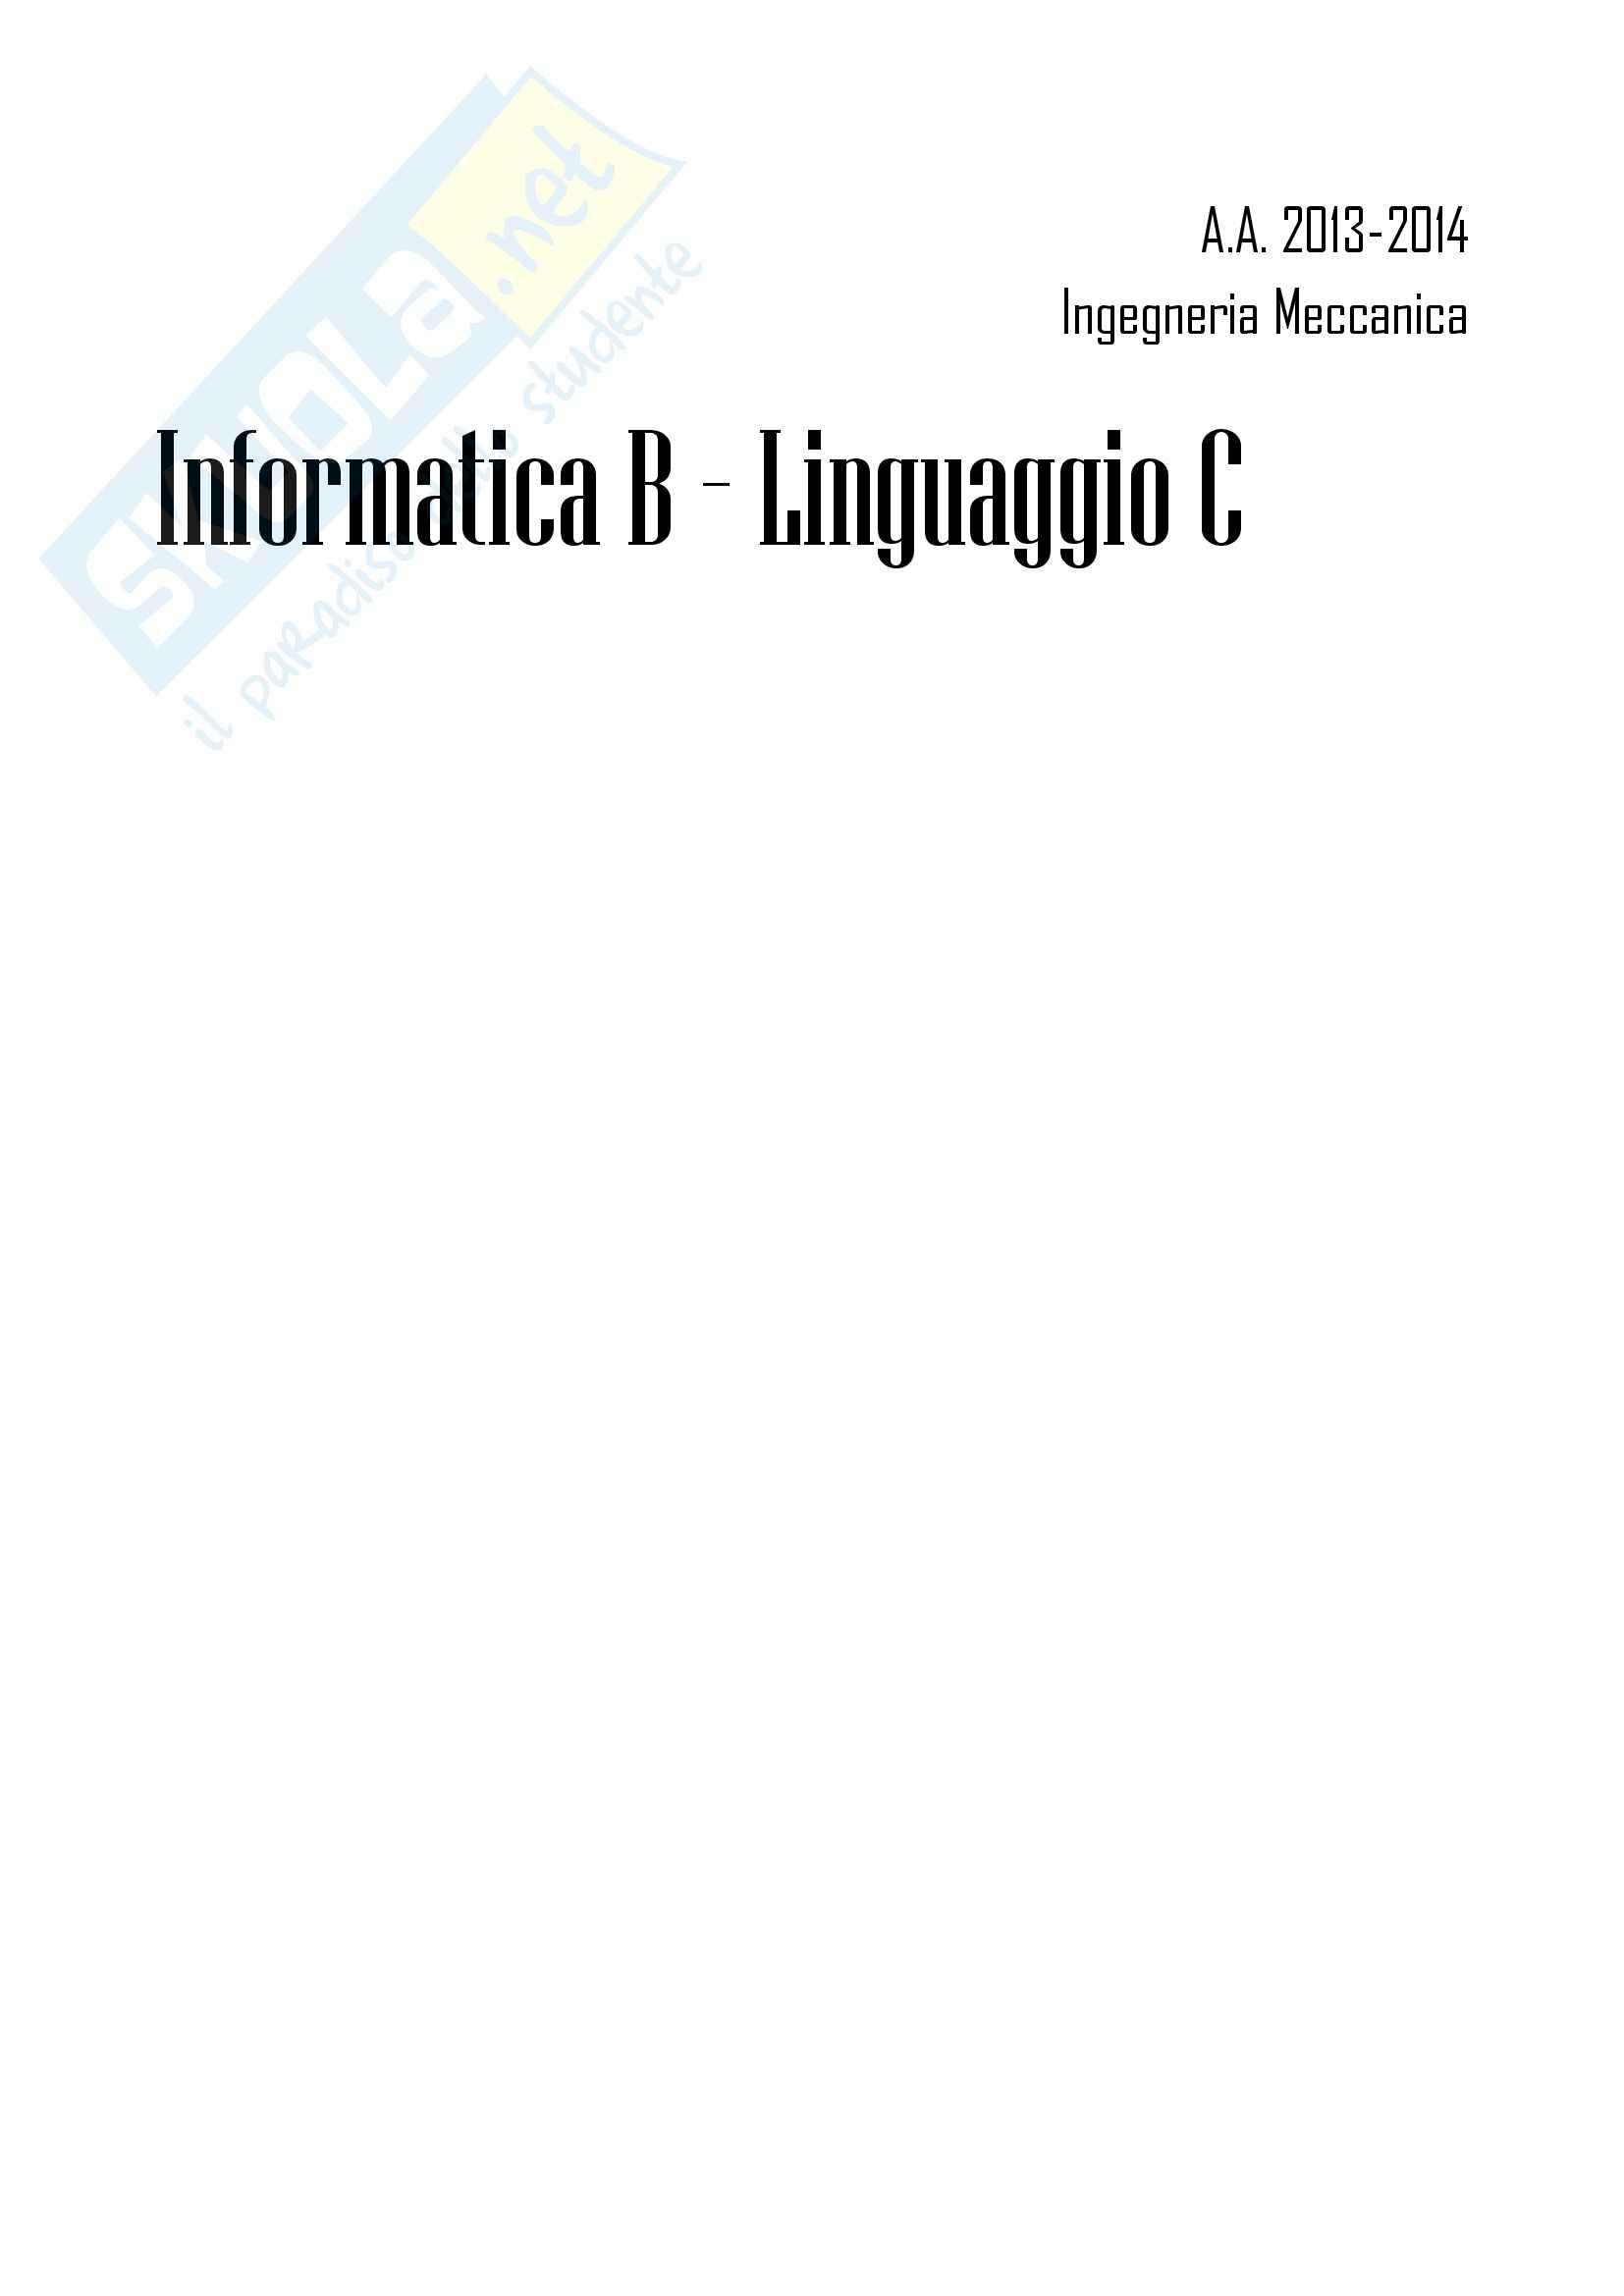 appunto M. Masseroli Informatica